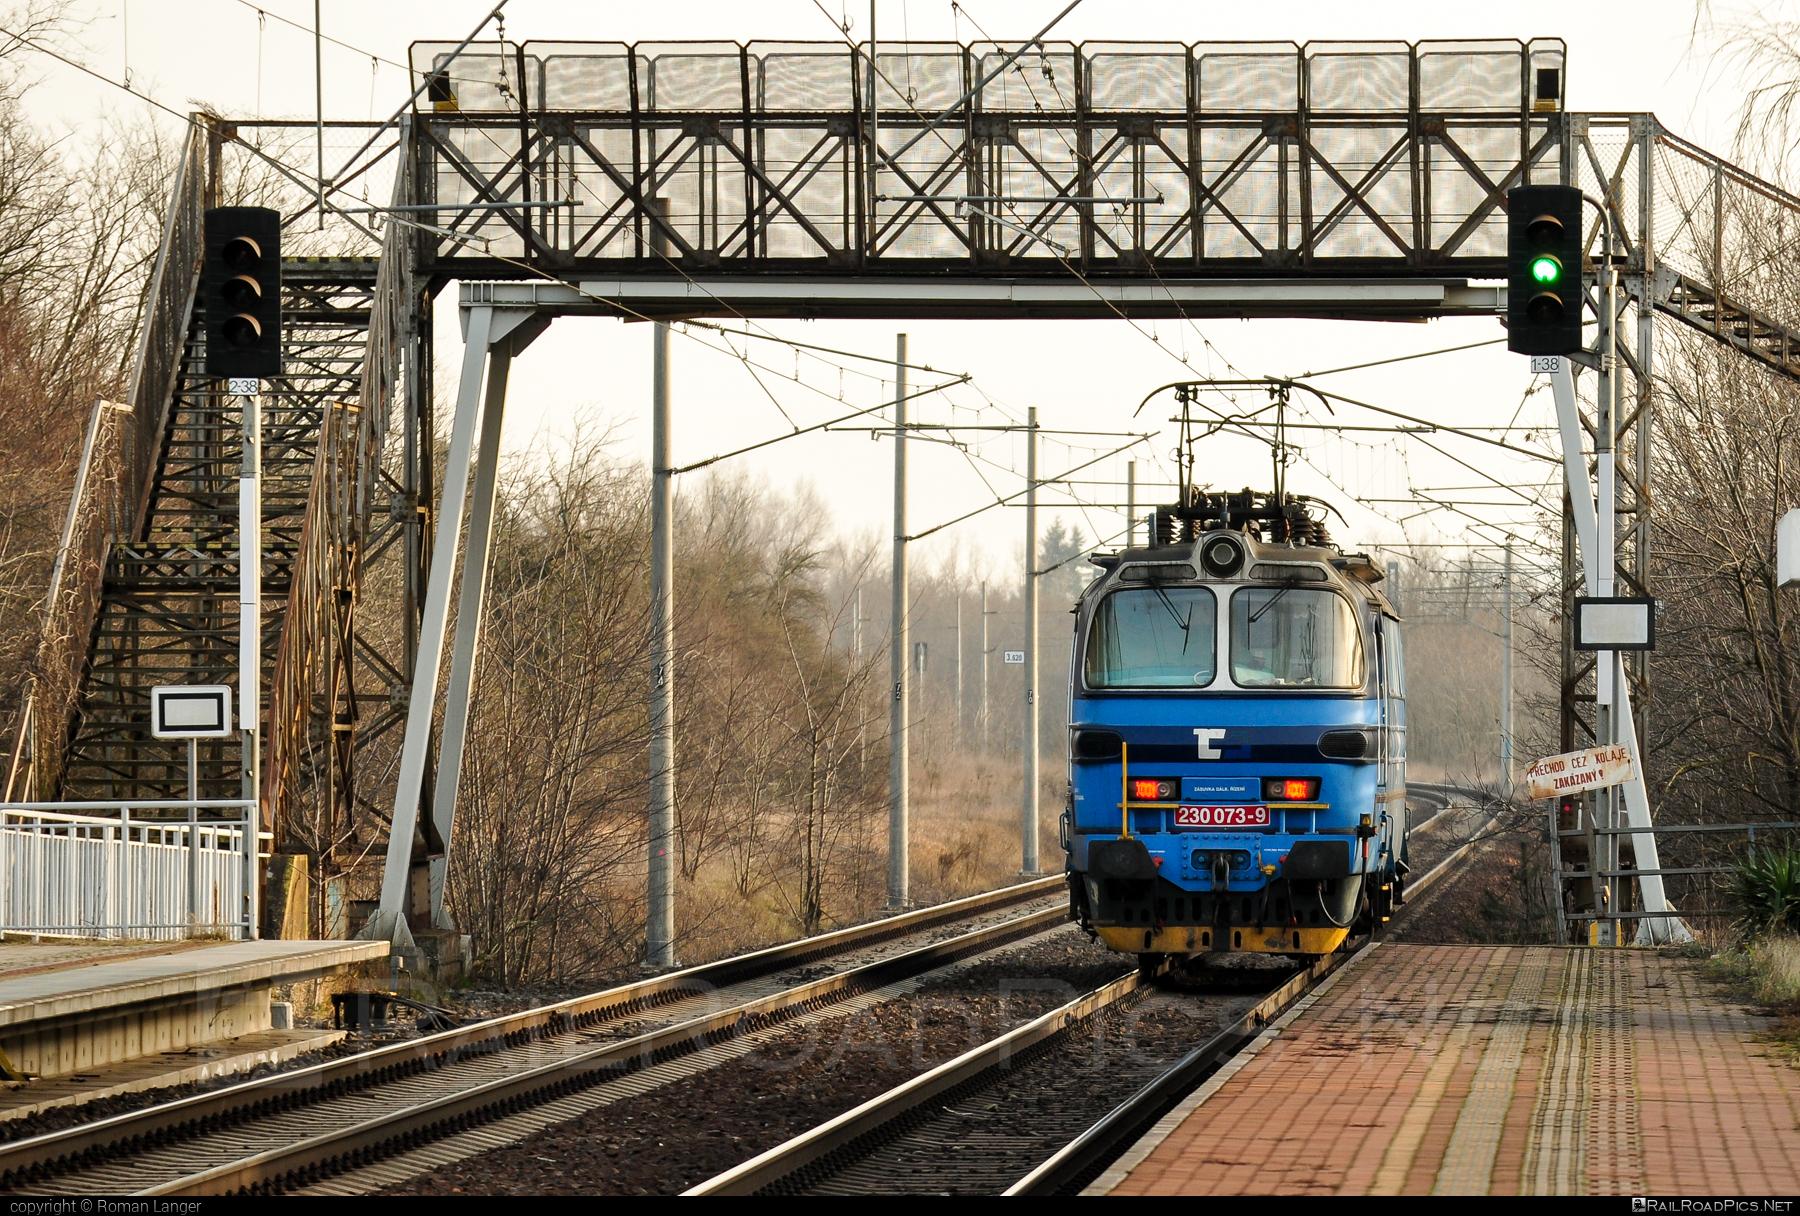 Škoda 47E - 230 073-9 operated by ČD Cargo, a.s. #cdcargo #laminatka #locomotive240 #skoda #skoda47e